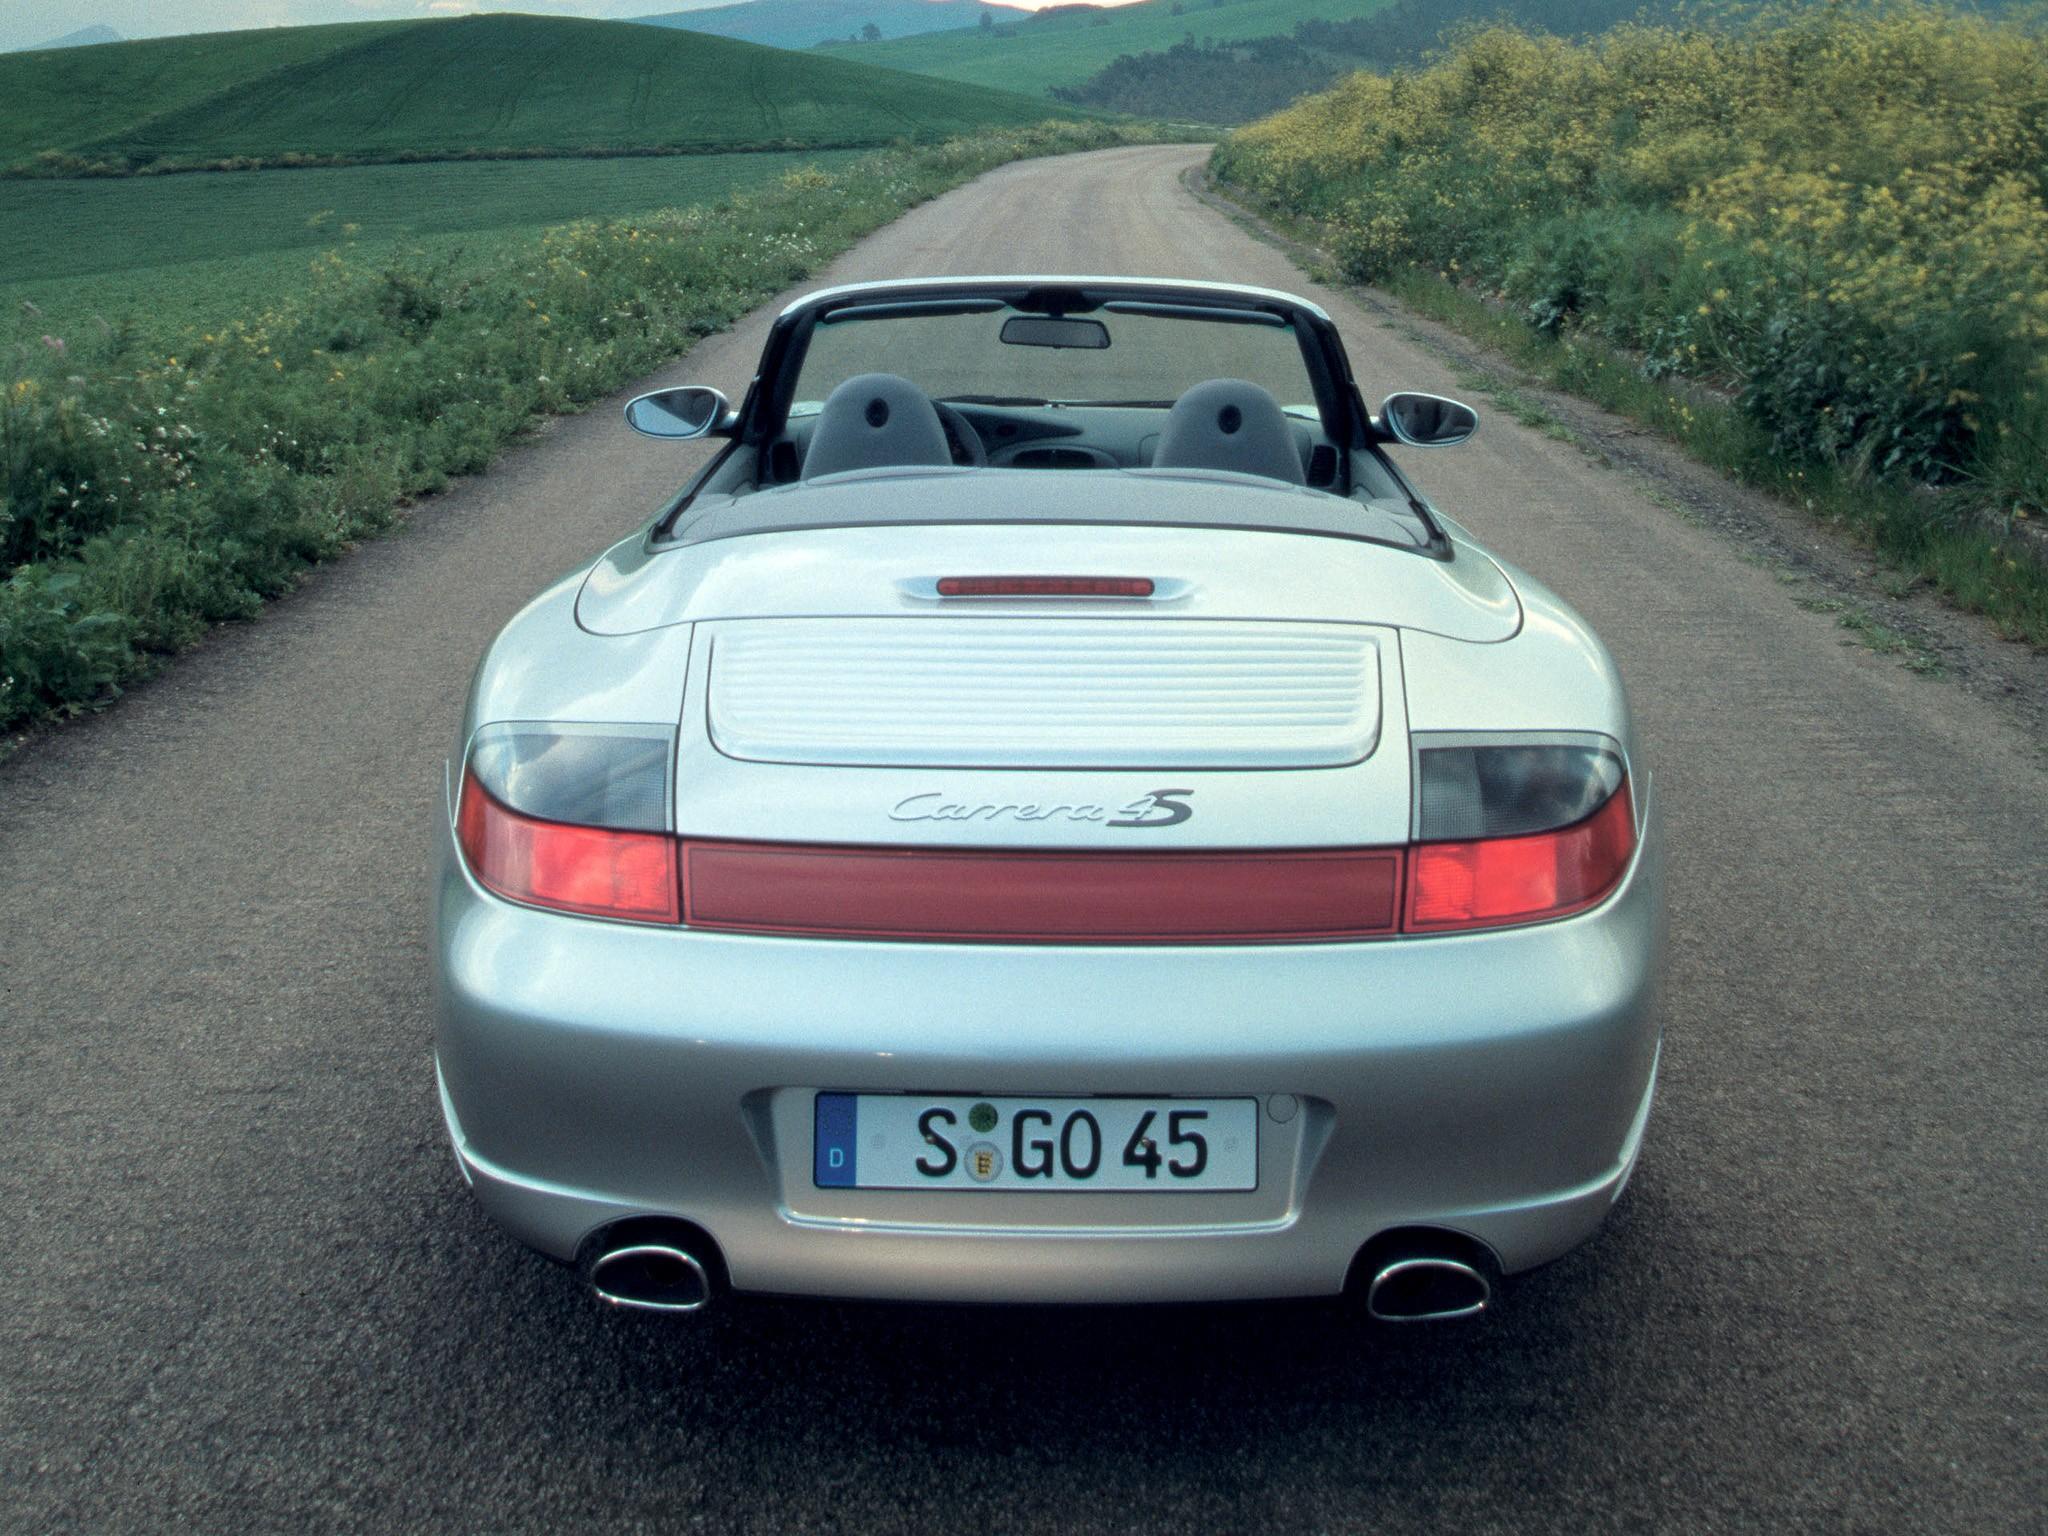 Porsche 911 Carrera 4s Cabriolet 996 2003 2004 2005